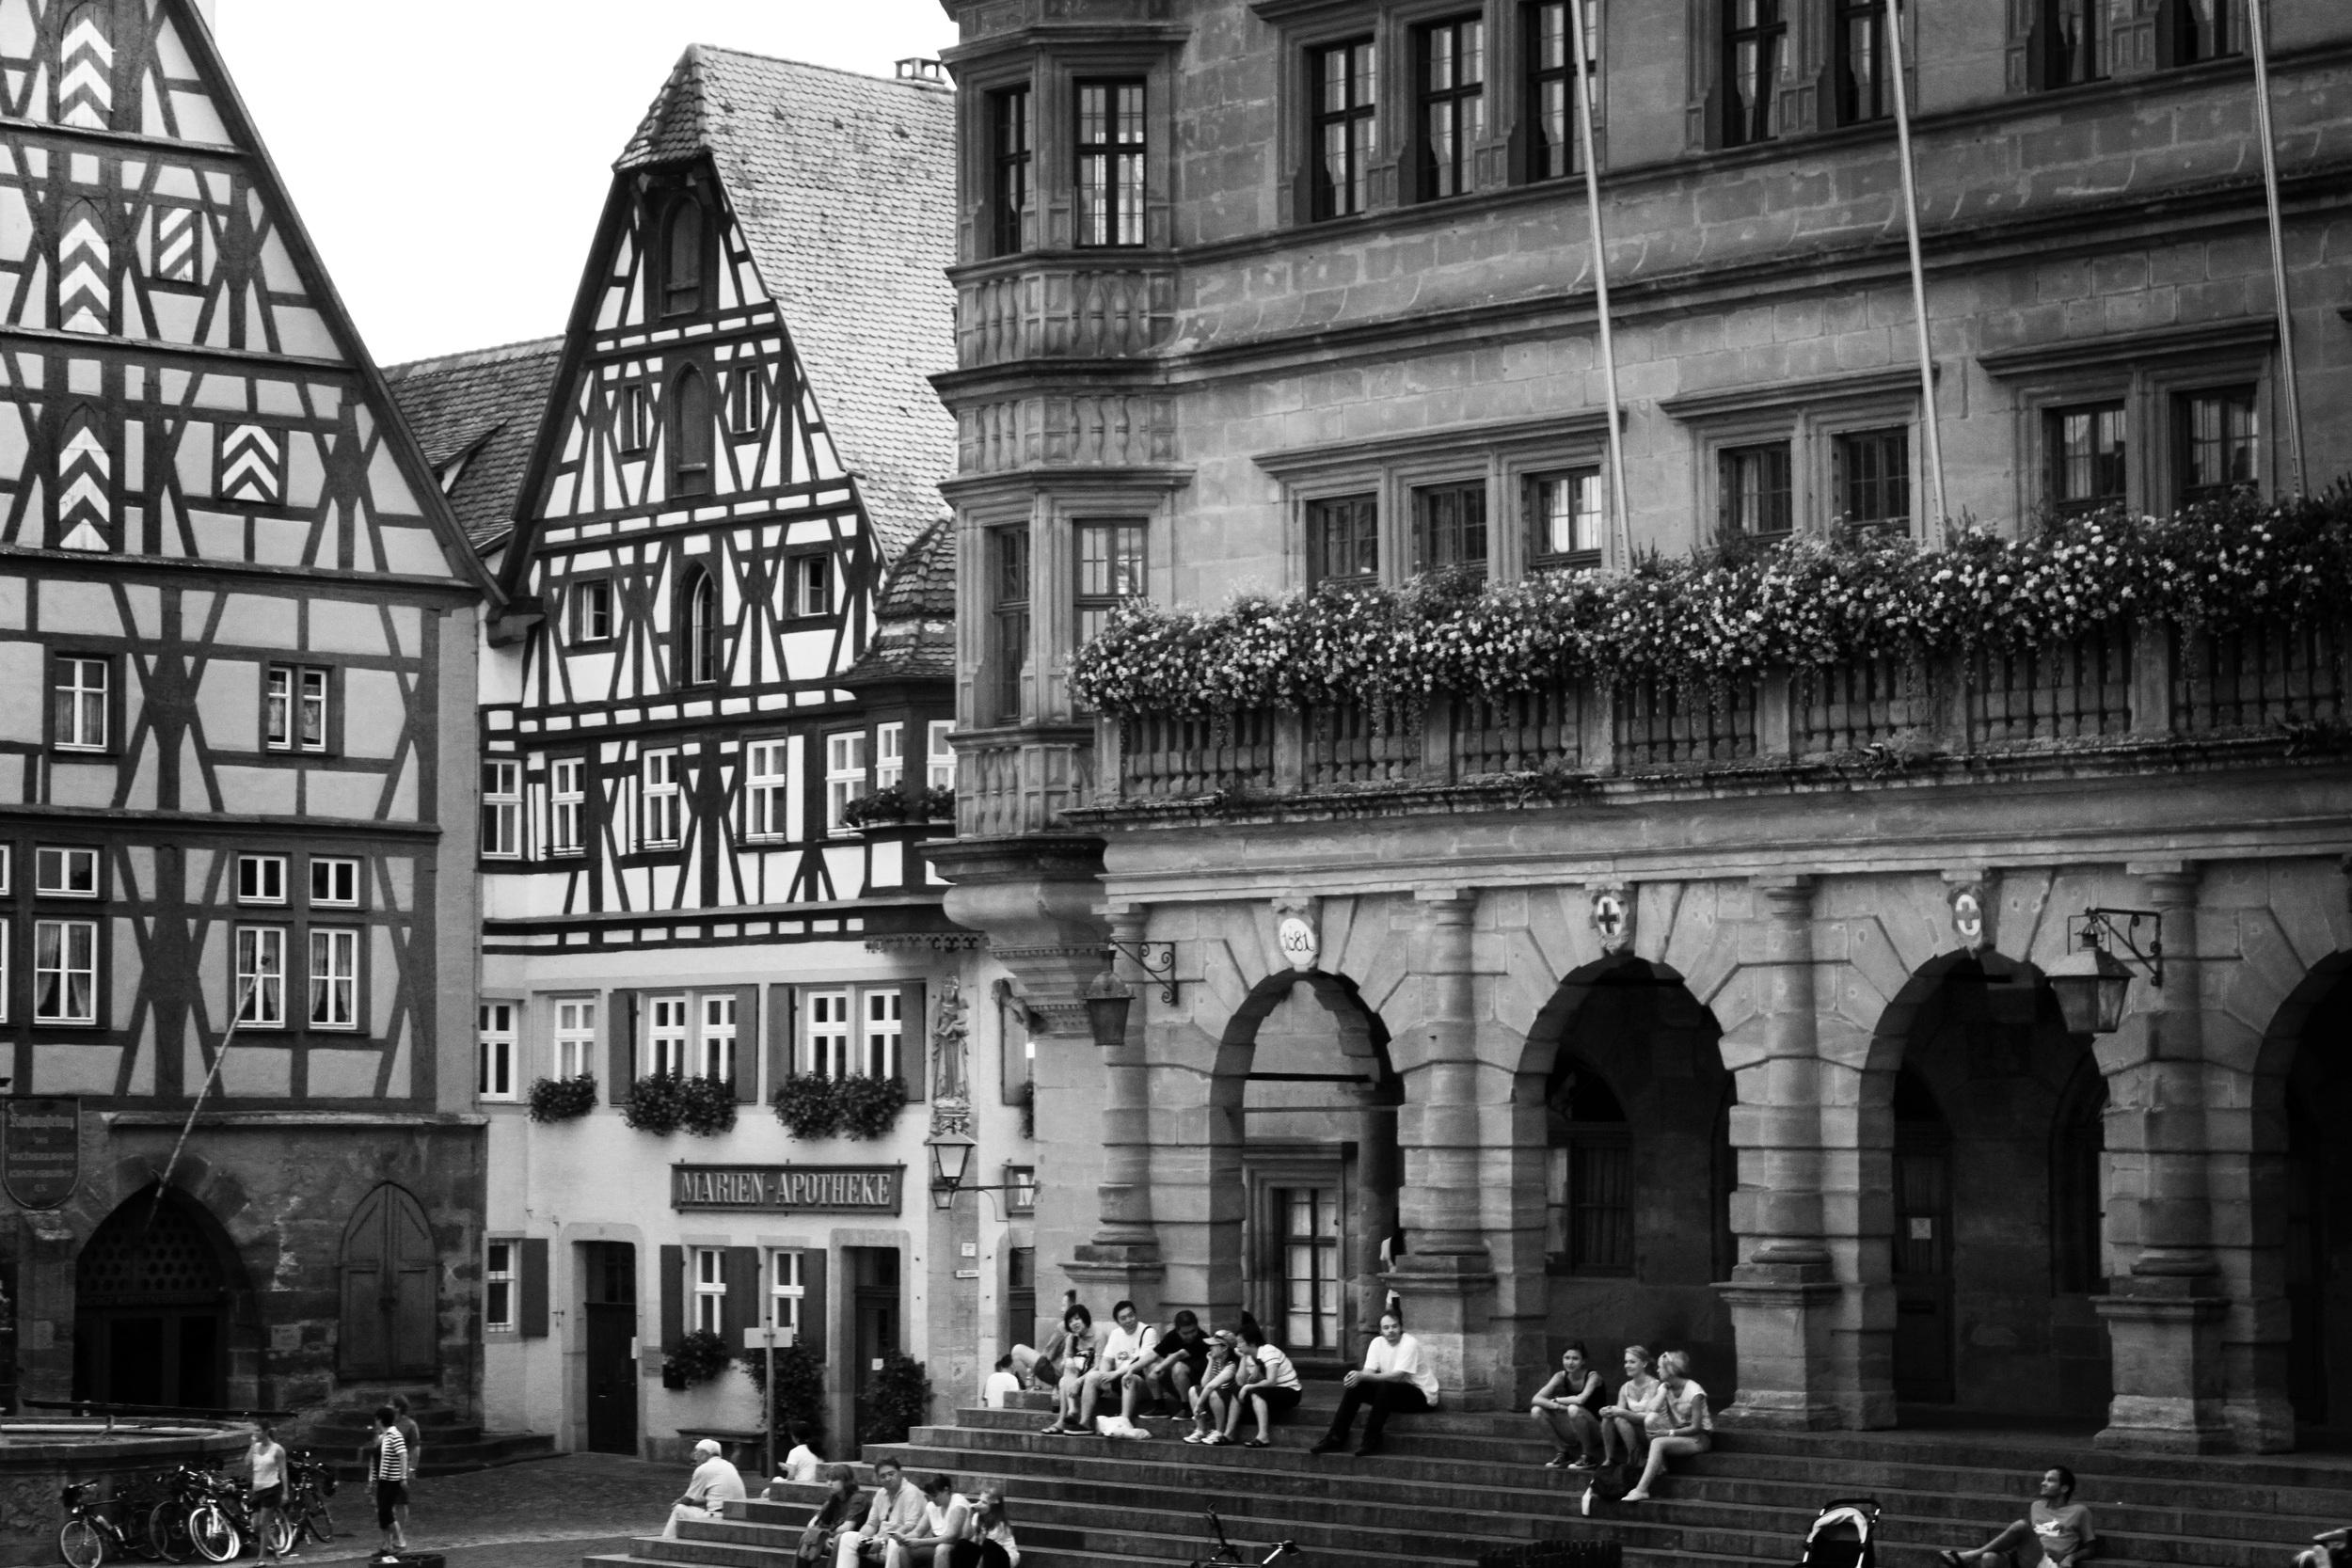 Rothenburg, Germany. ©Amanda Benincasa